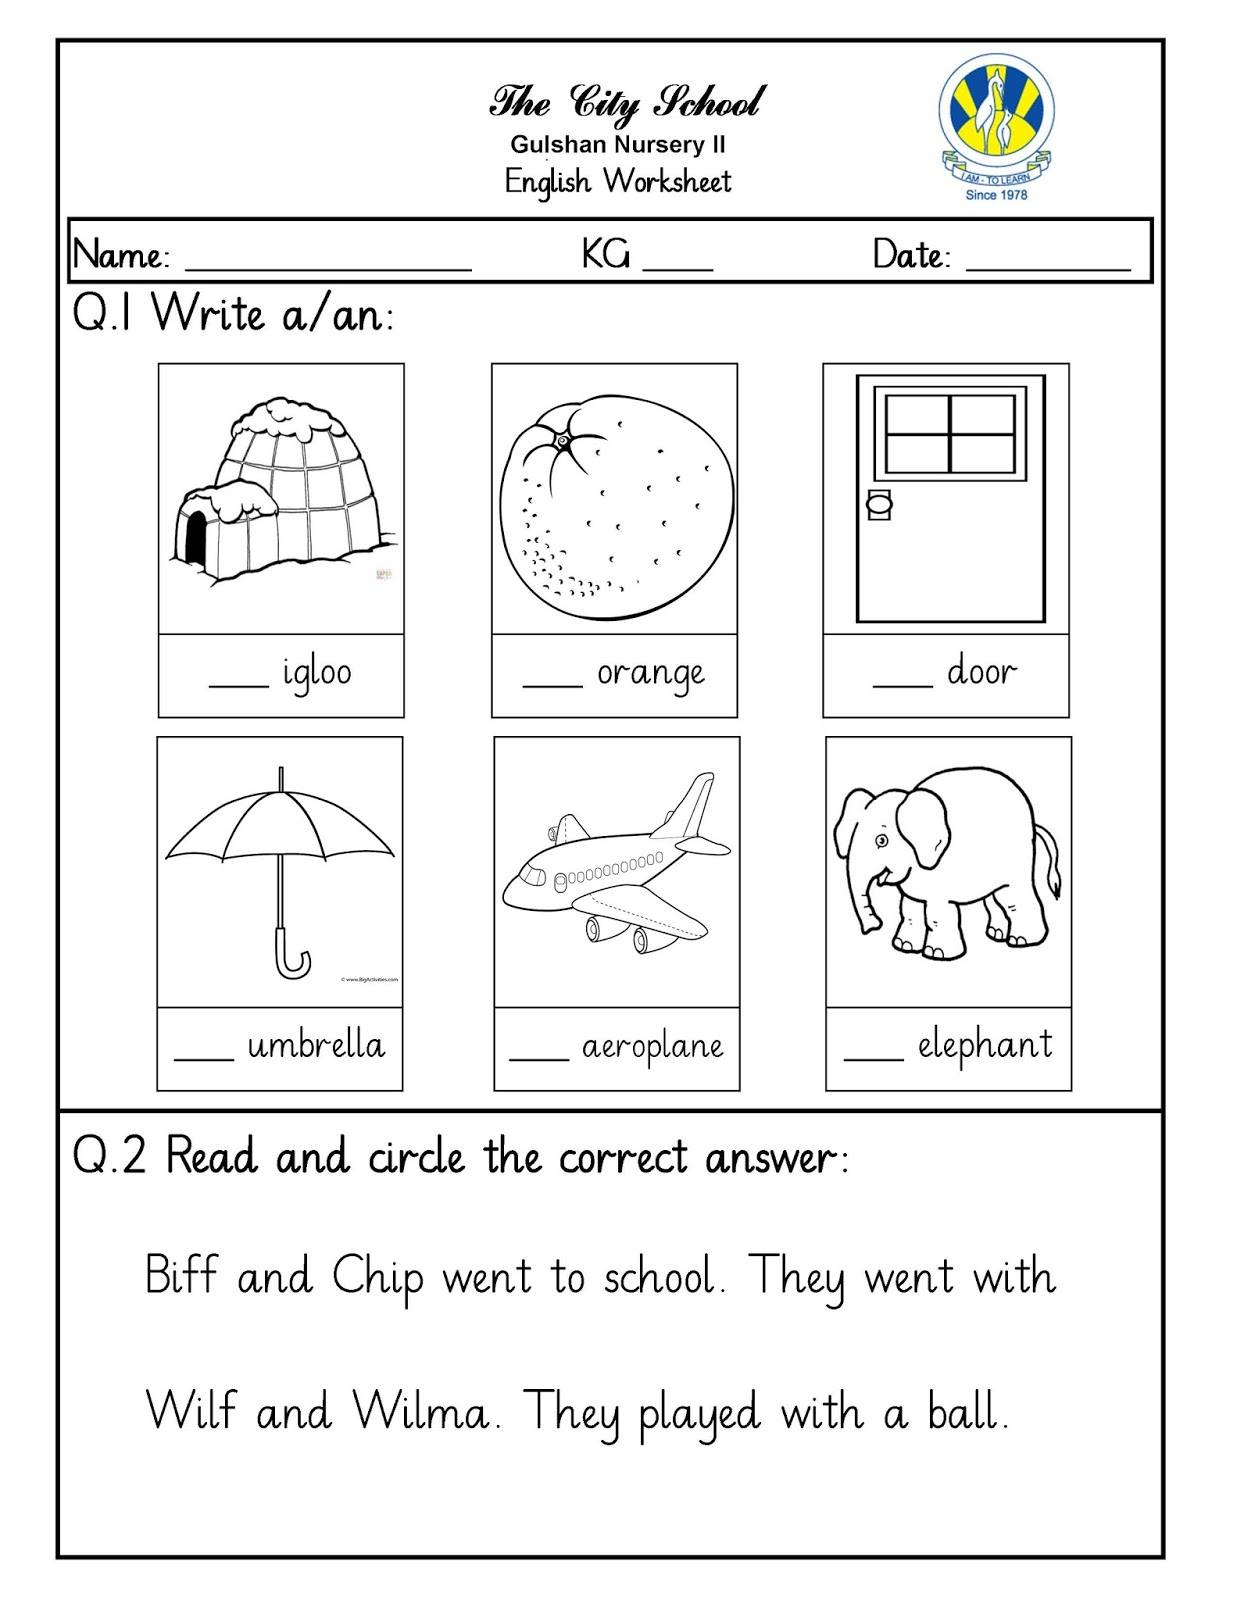 Sr Gulshan The City Nursery Ii English Kuwa And Math Worksheets